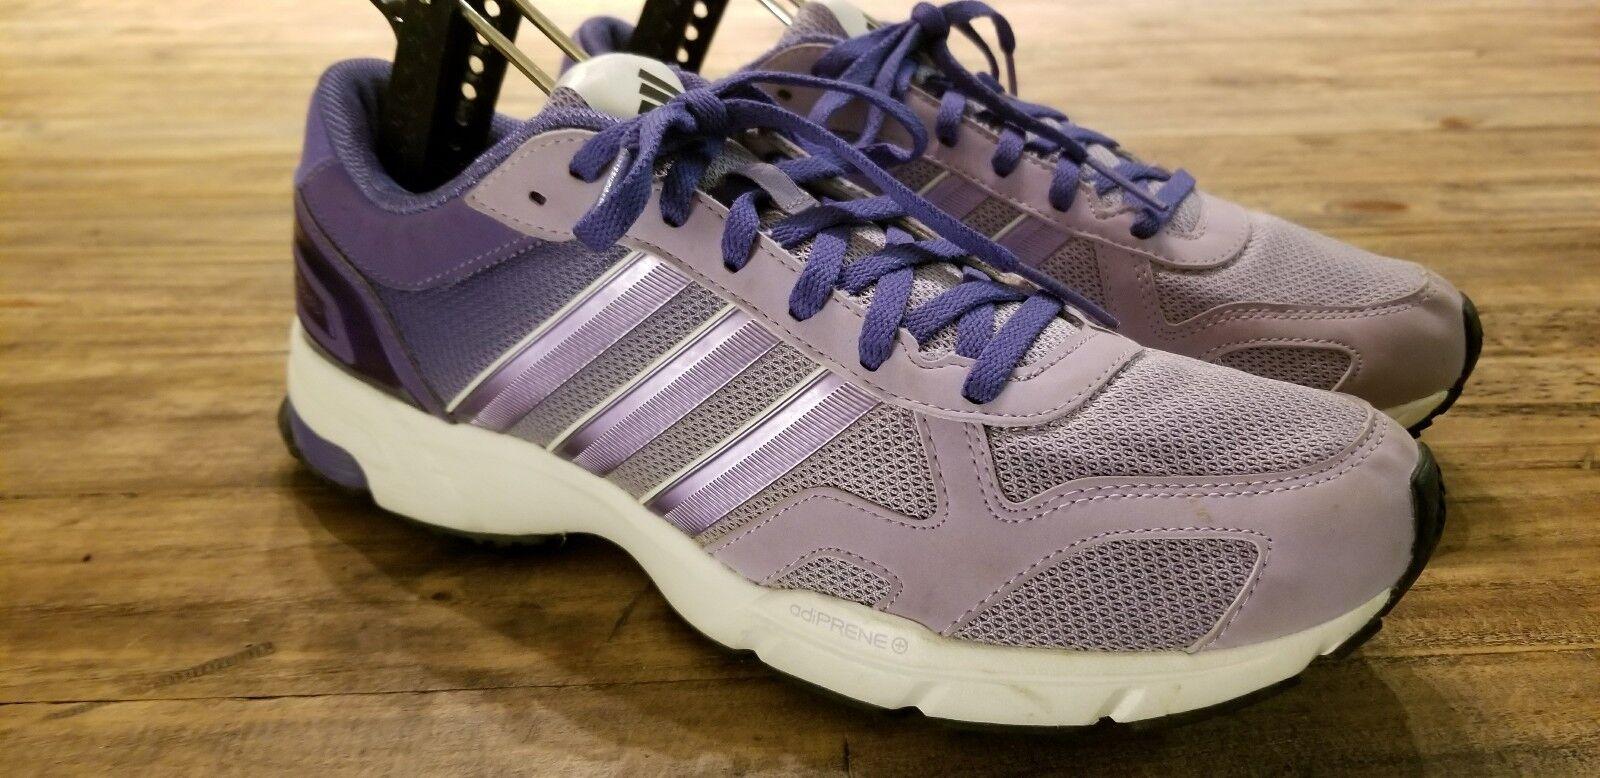 ADIDAS MARATHON 10.5 Womens TRAIL RUNNING SHOES Training Purple White Womens 10.5 Size 10 255afa